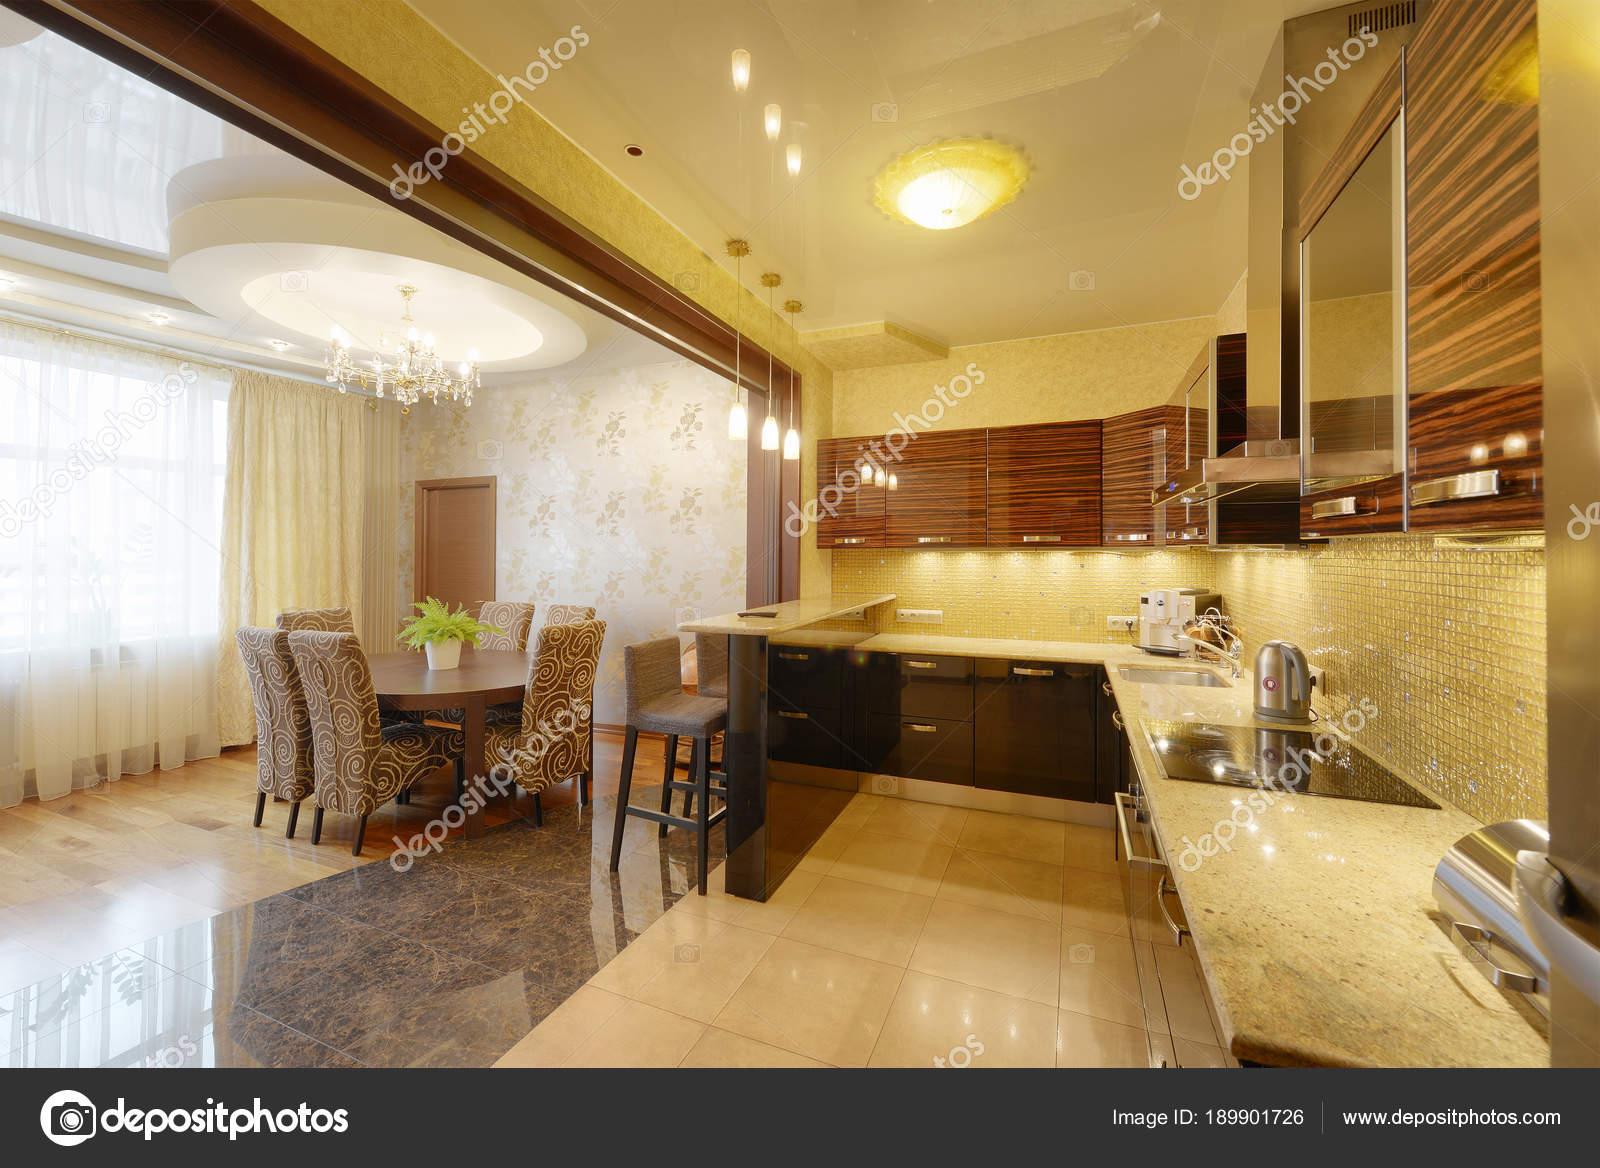 Cocina Moderna Diseño Interiores Casa Nueva — Fotos de Stock ...